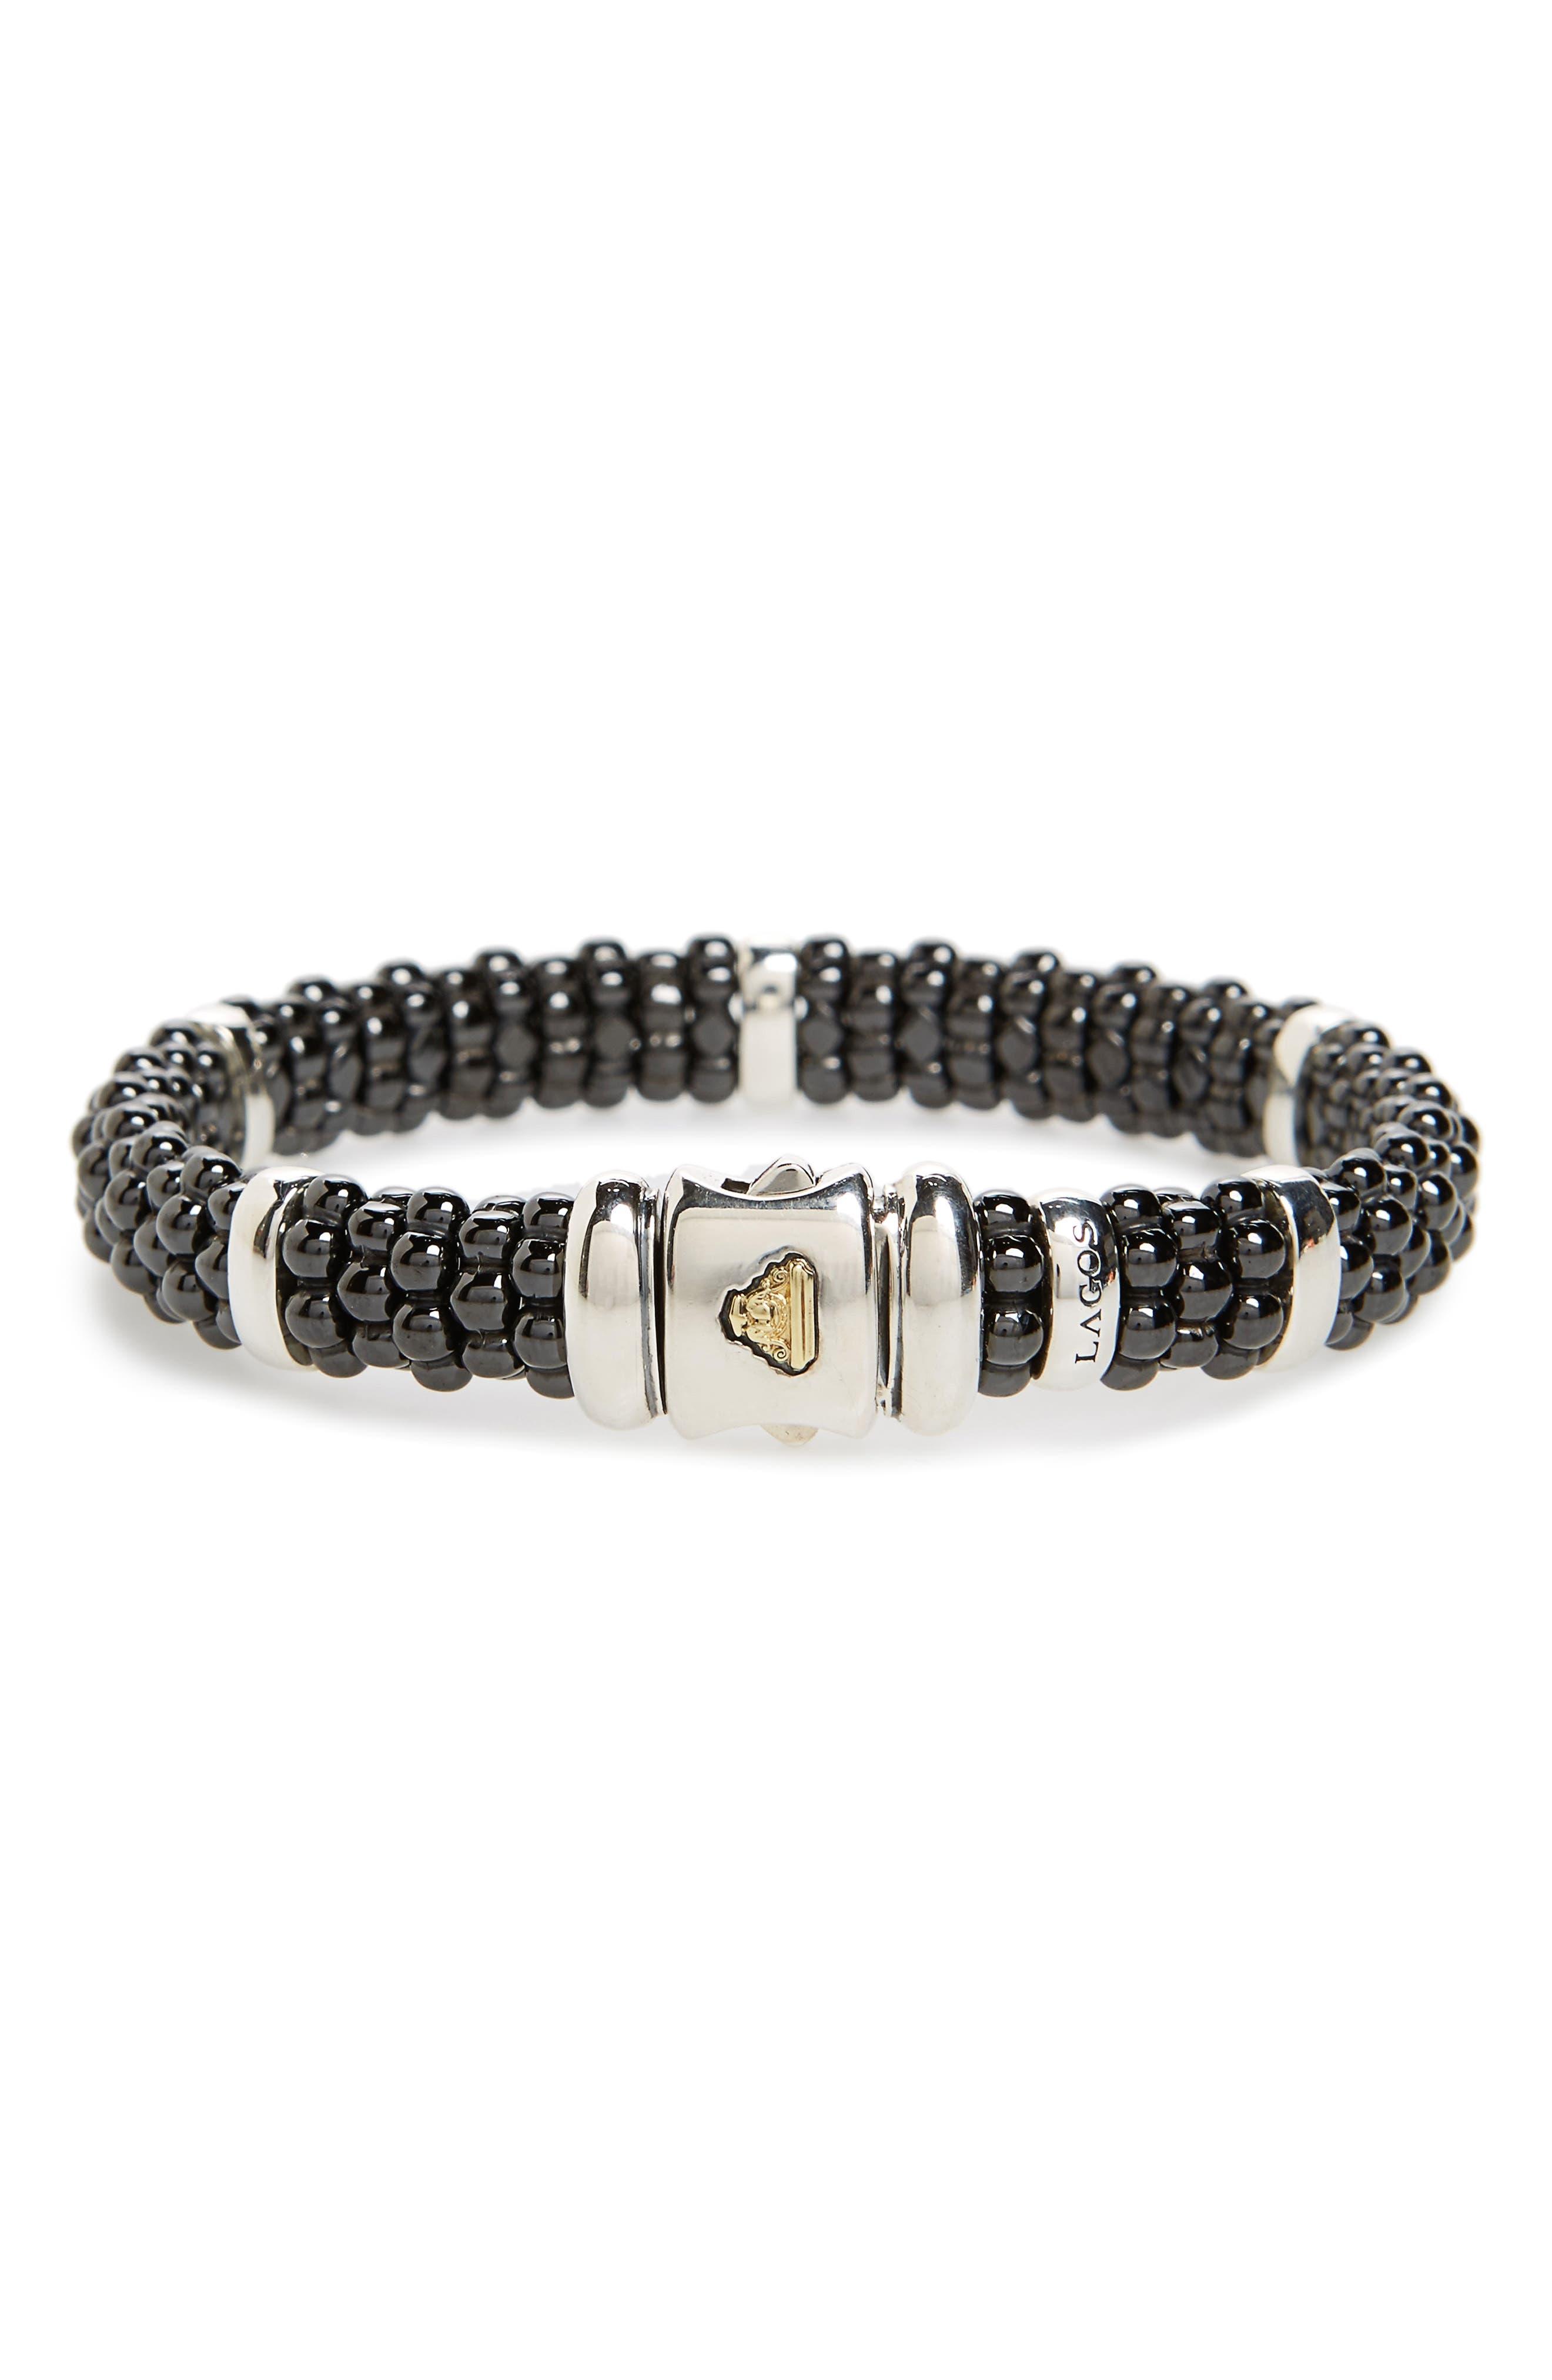 Black Caviar Station Bracelet,                         Main,                         color, BLACK/ SILVER/ GOLD